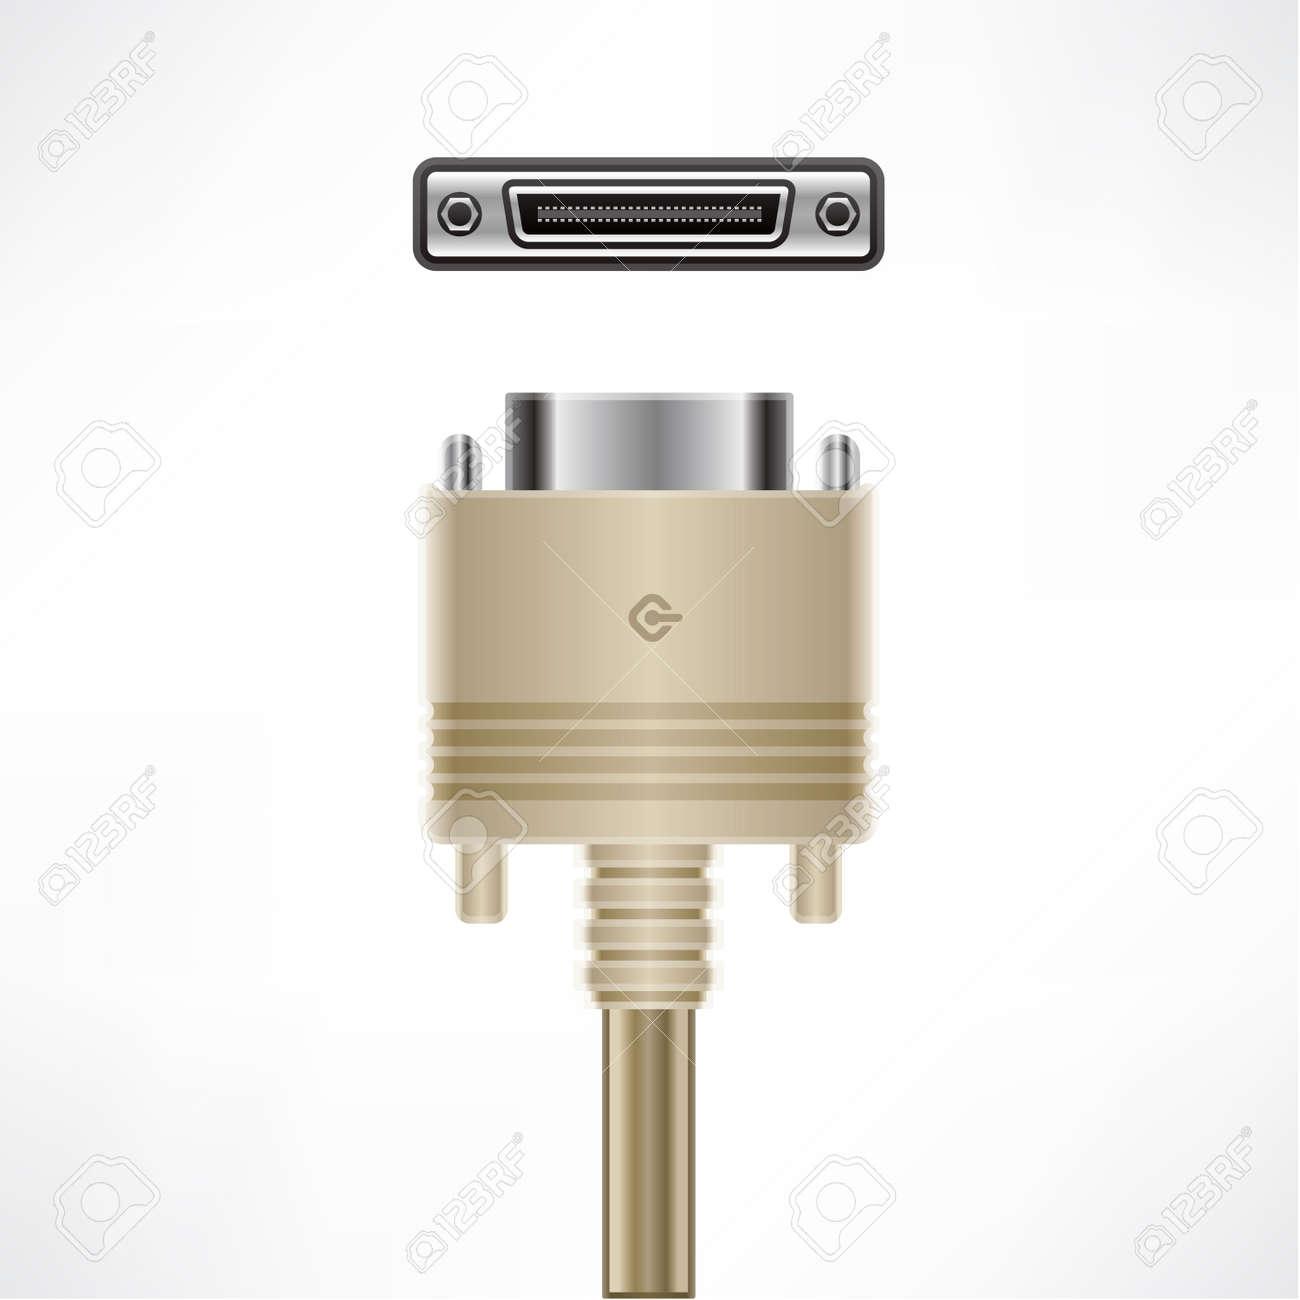 SCSI High Density Centronics 60-Pin plug socket Stock Vector - 10273186